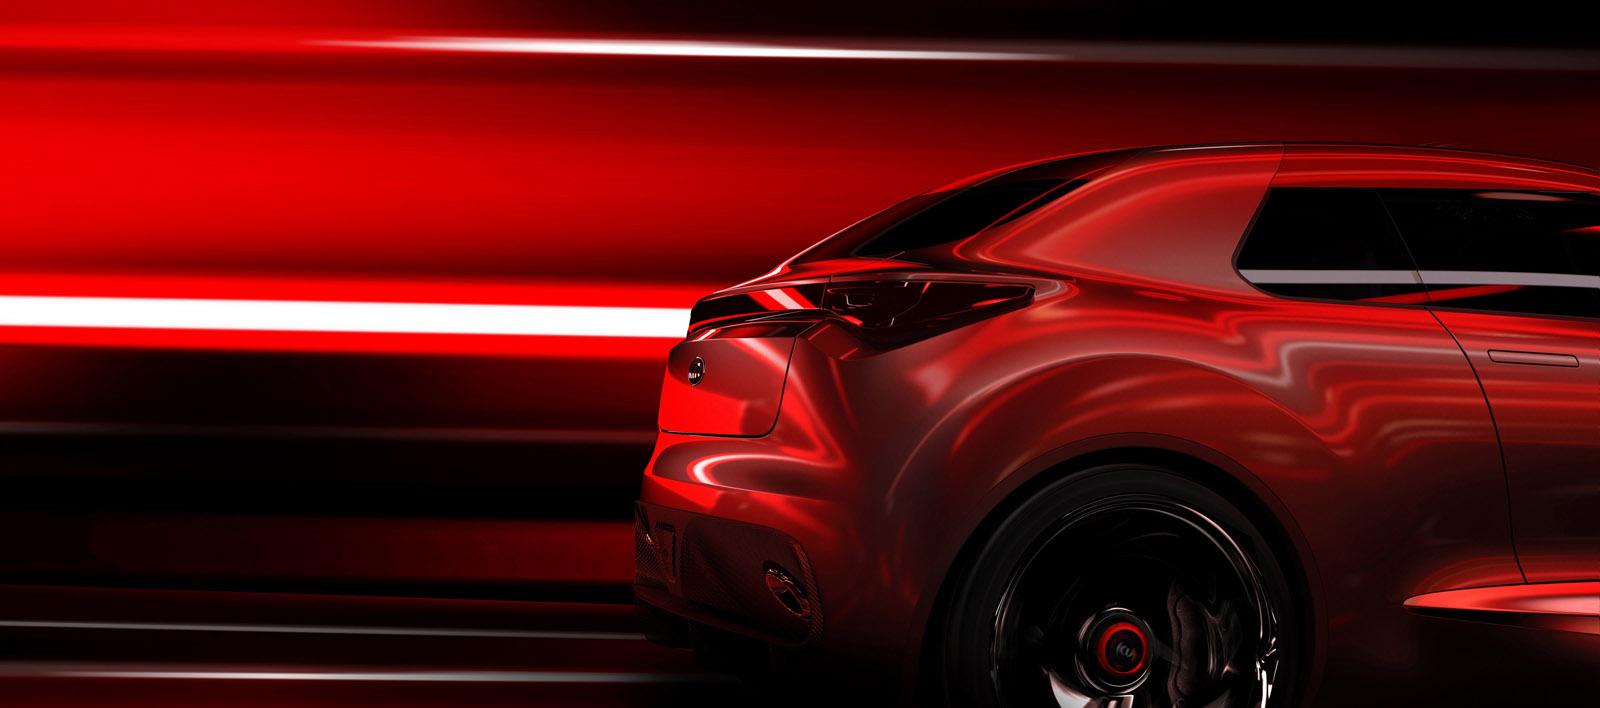 Kia concept Geneva Motor Show 2013